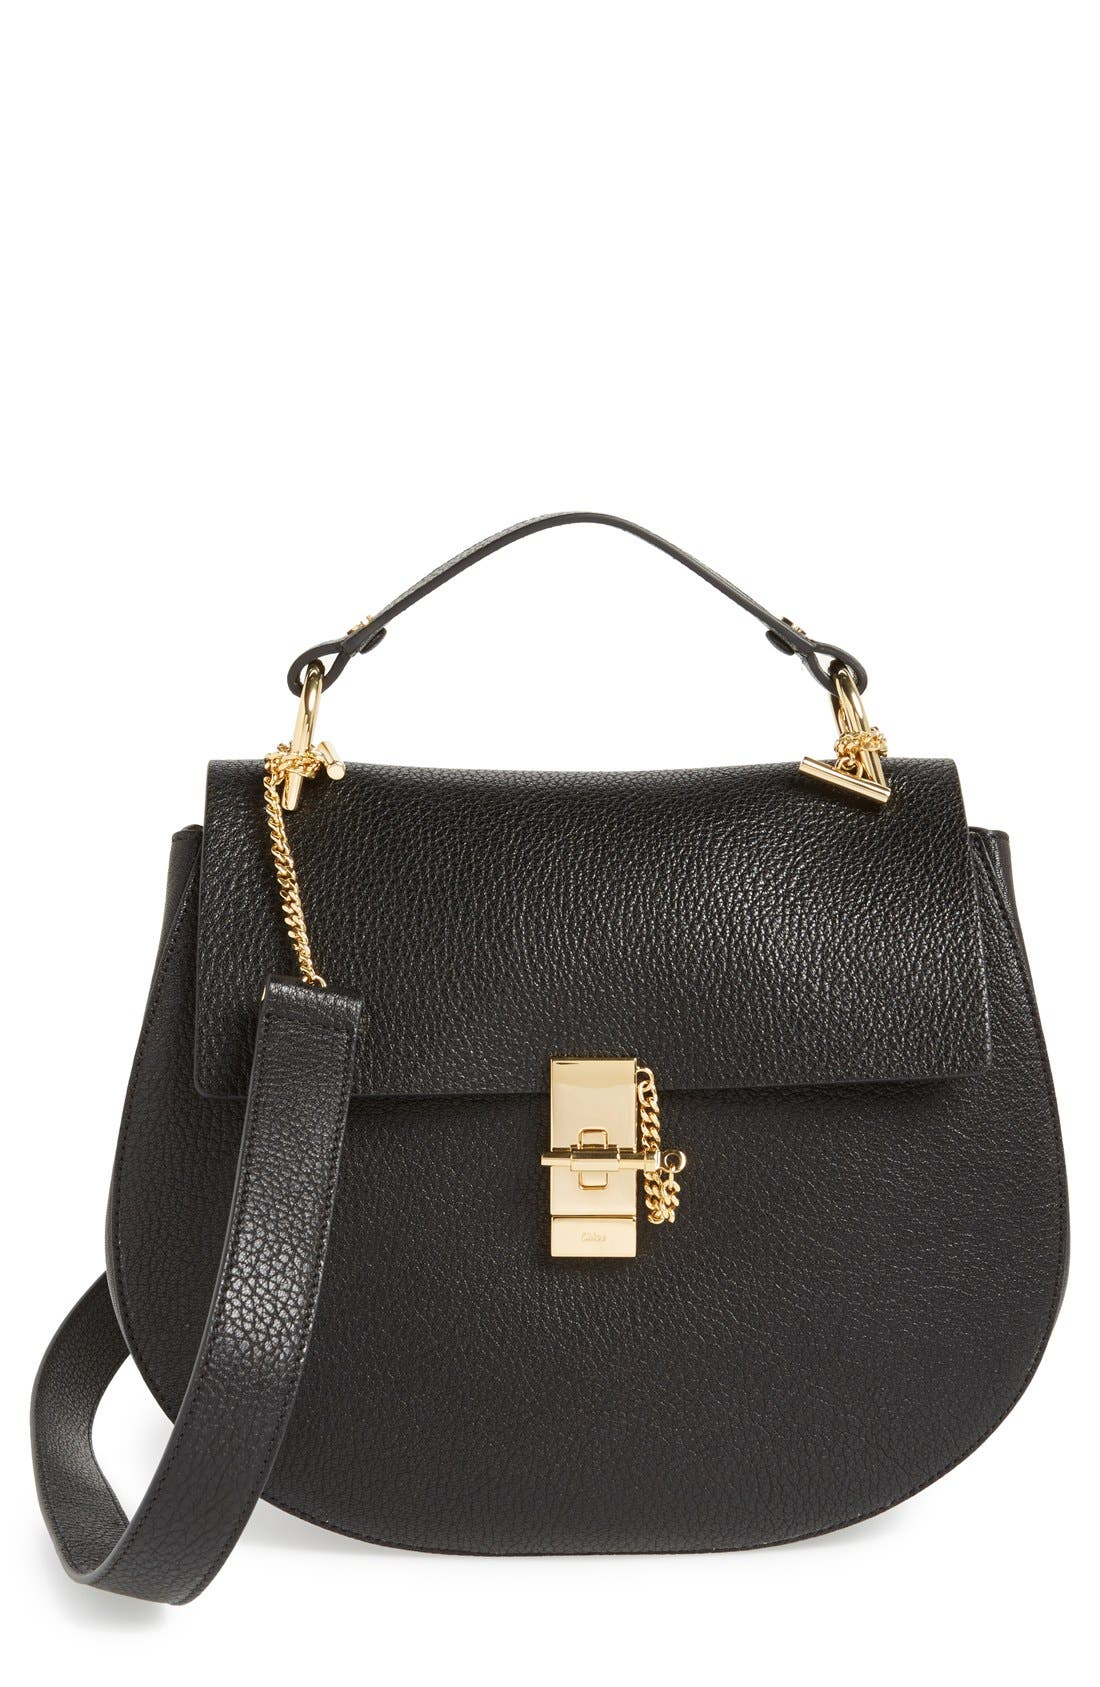 Alternate Image 1 Selected - Chloé 'Drew - Medium' Leather Crossbody Bag